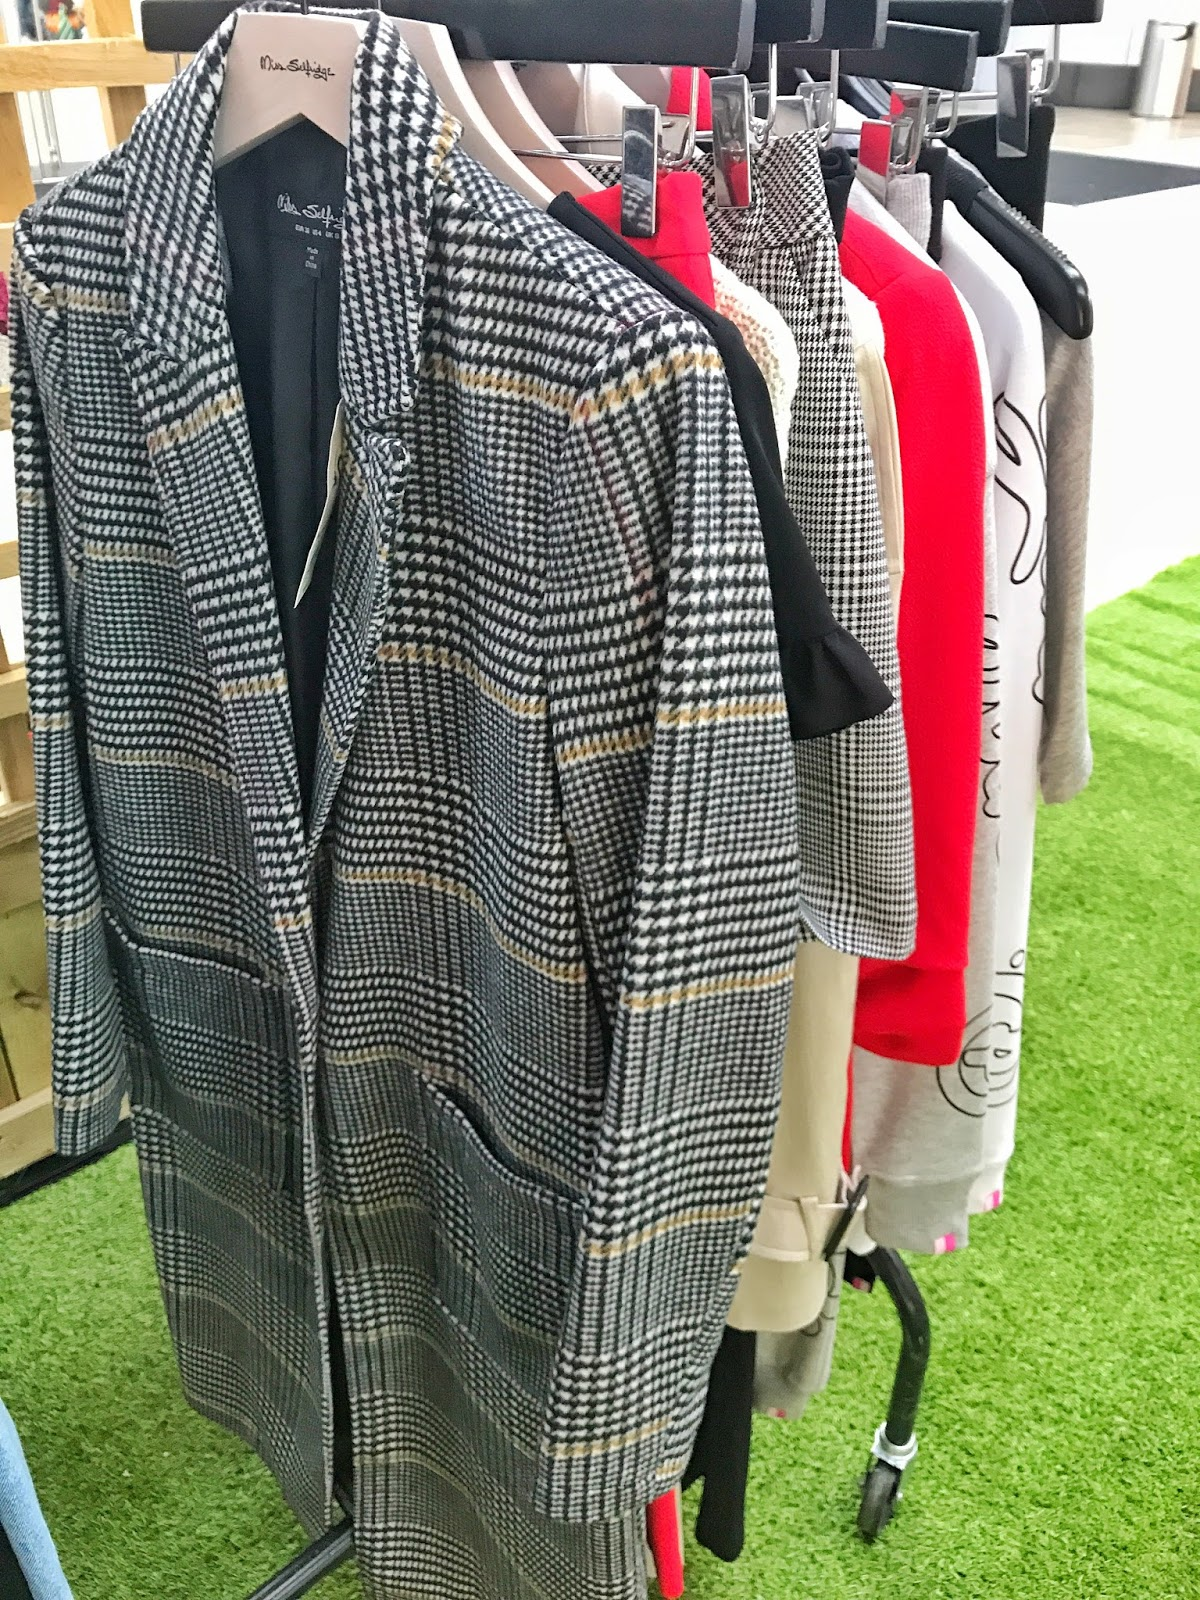 intu, Style Garden, Milton Keynes, Love MK, MK Blogger, Fashion, AW17, red, prince of Wales, trend